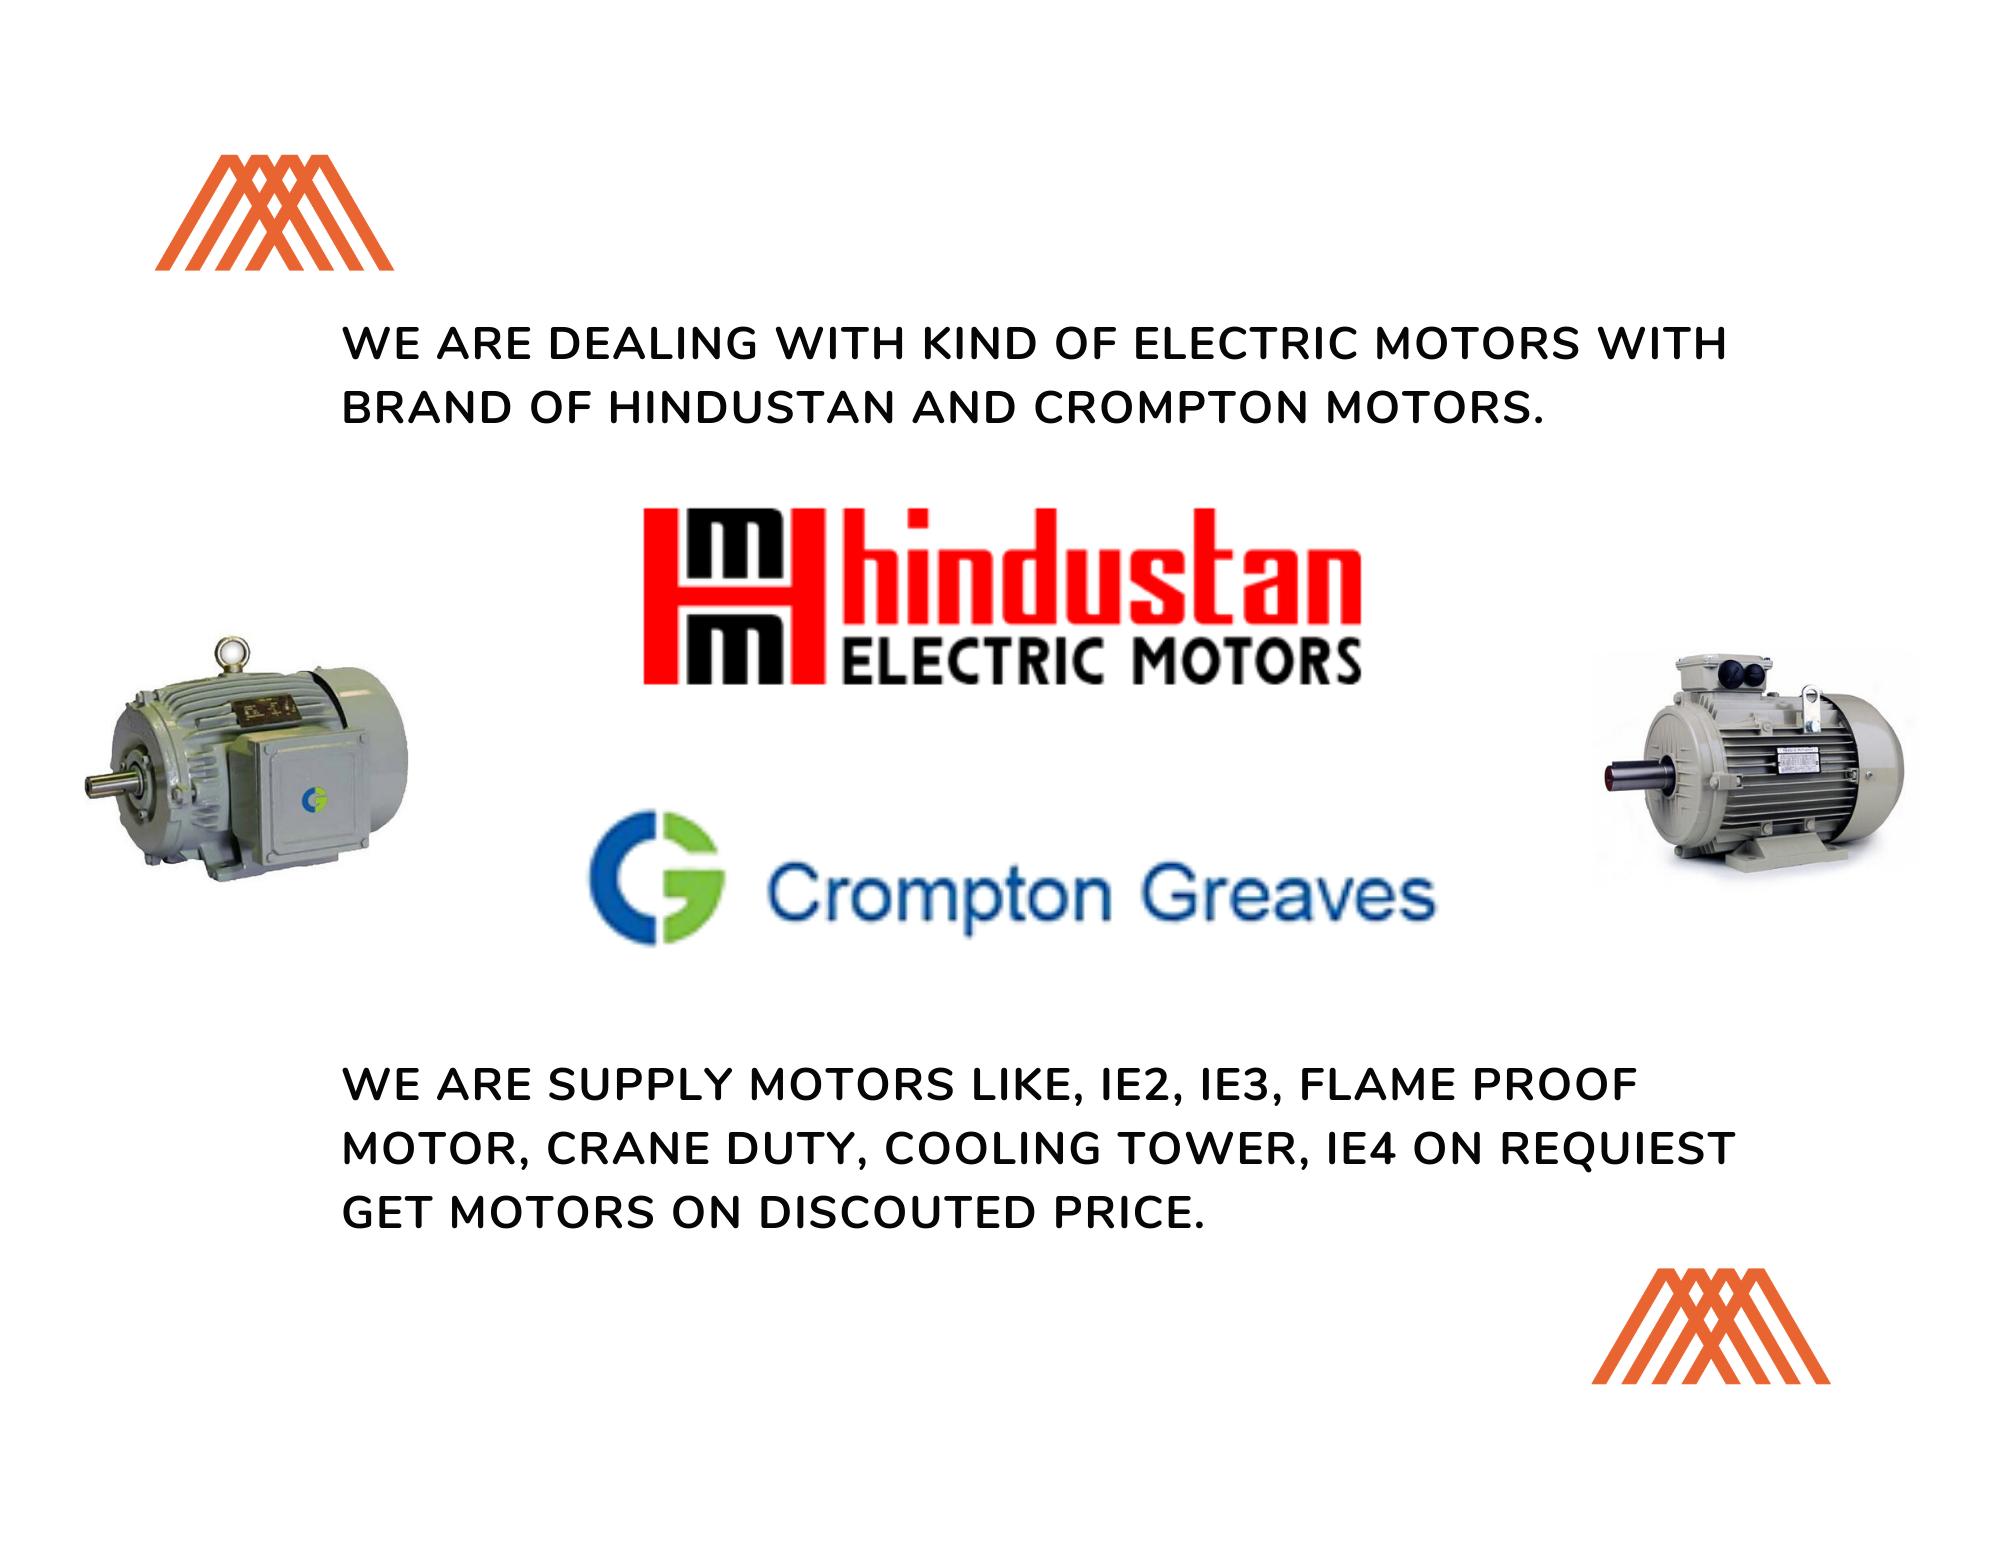 Hindustan Electric Motor